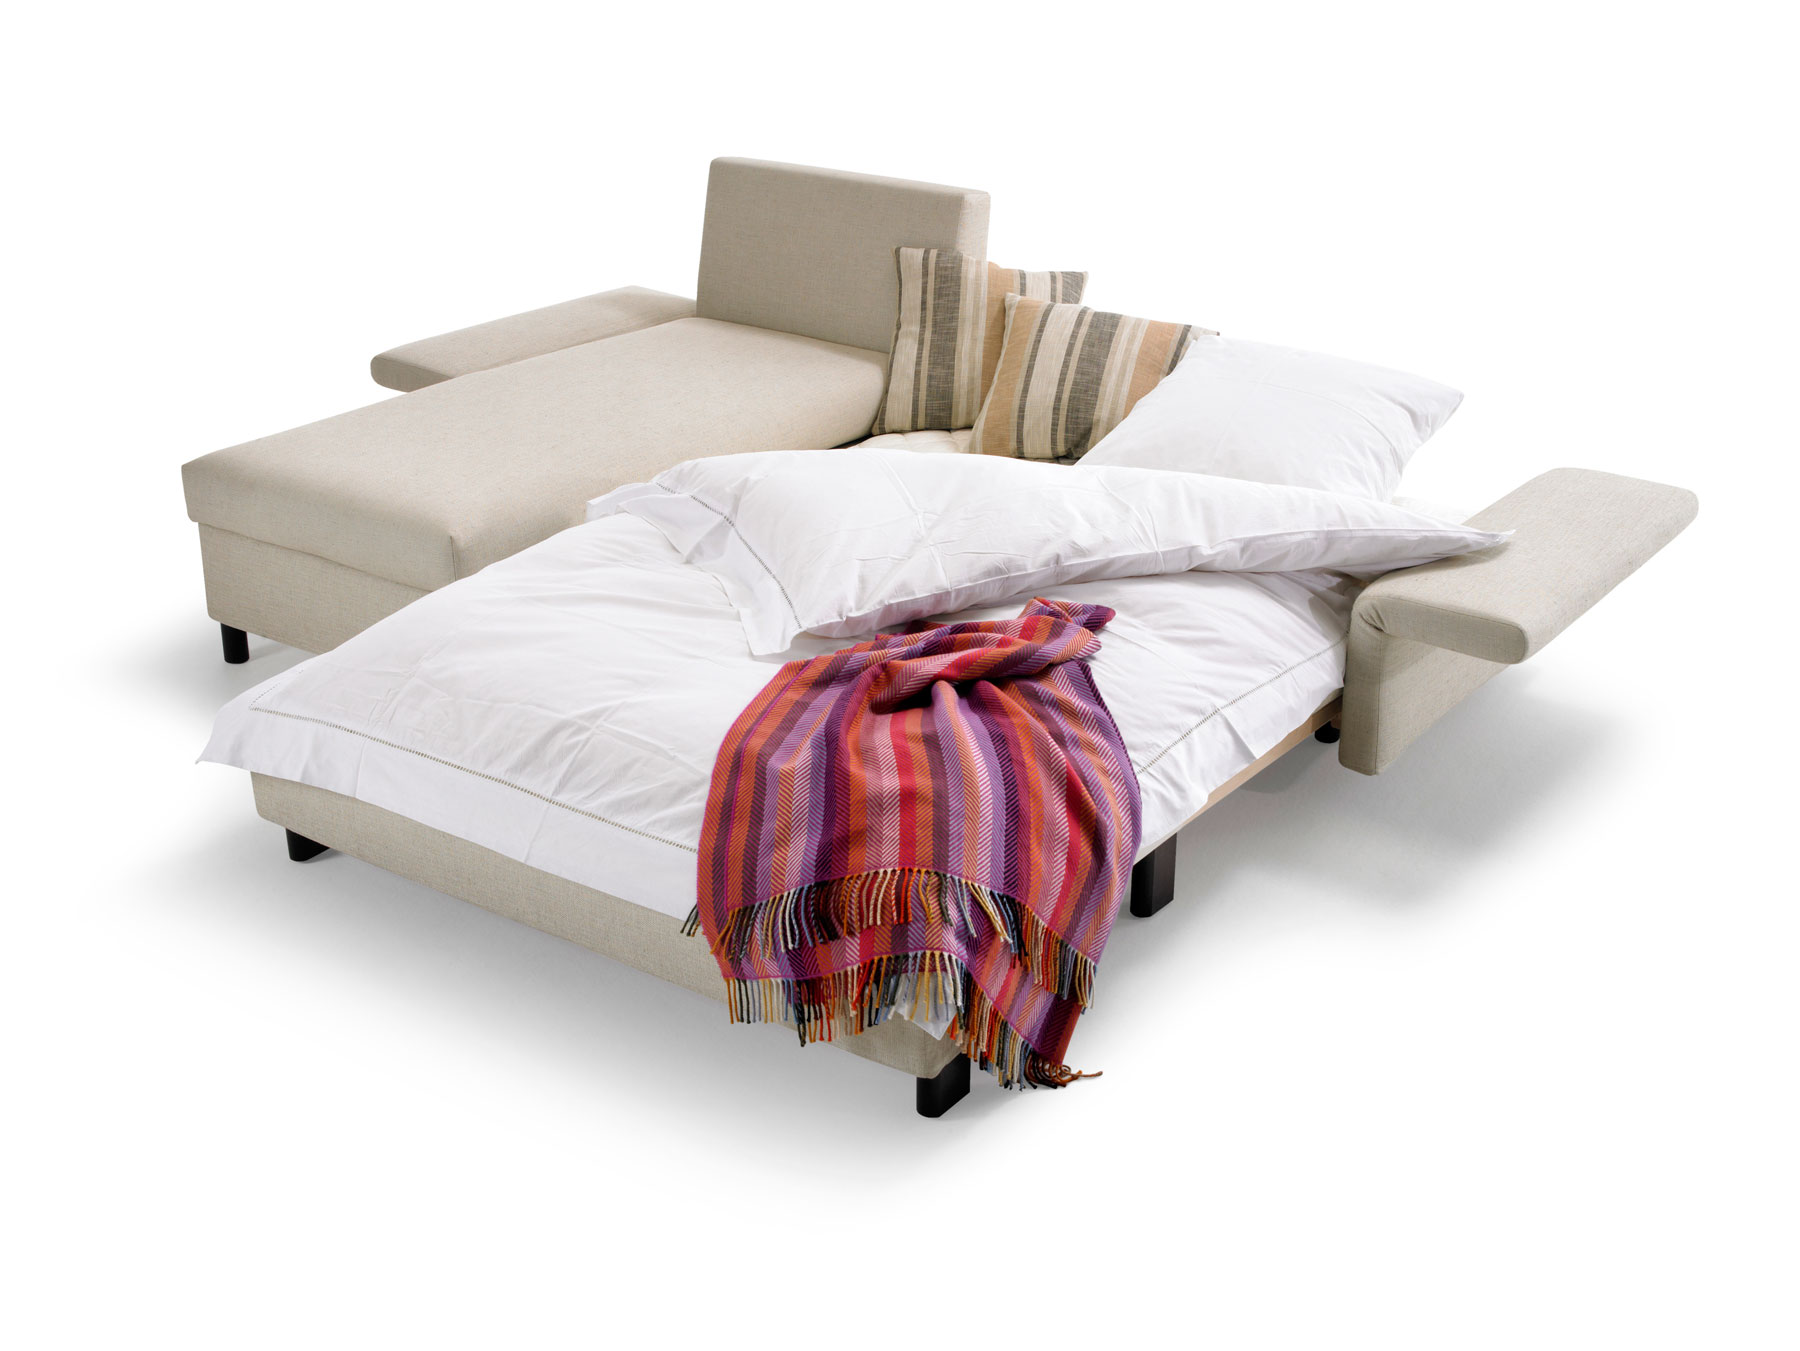 signet paula schlafsofa paula ein schlafsofa f r kleine r ume. Black Bedroom Furniture Sets. Home Design Ideas